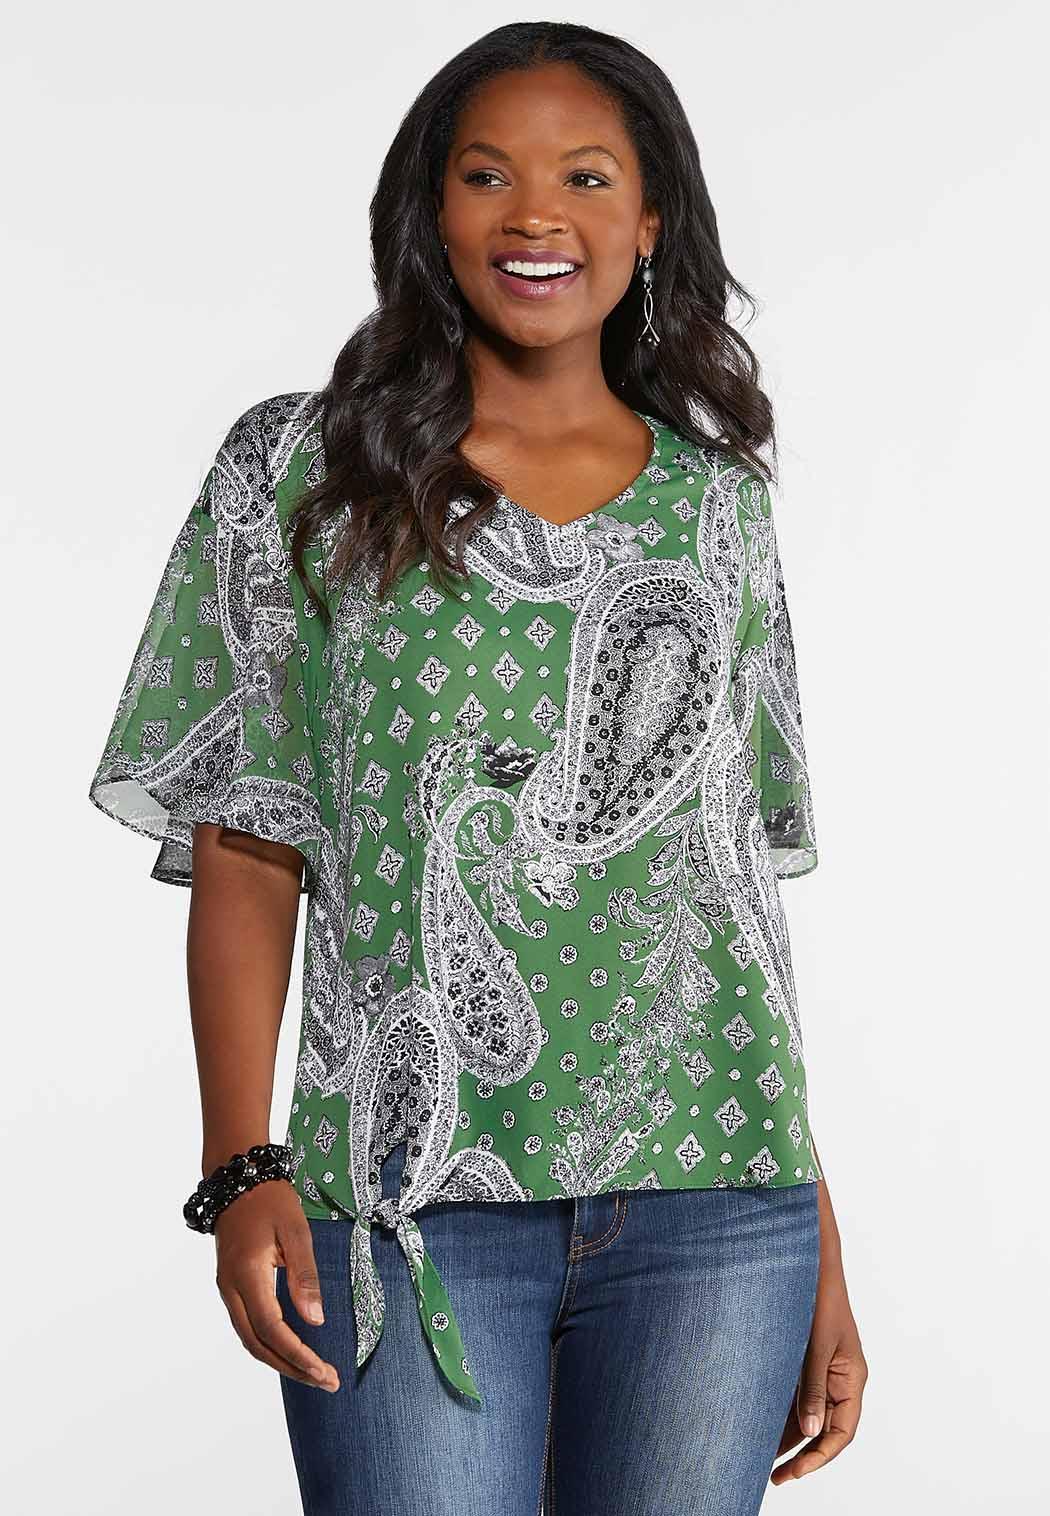 bef2afbcf Women's Shirts & Blouses